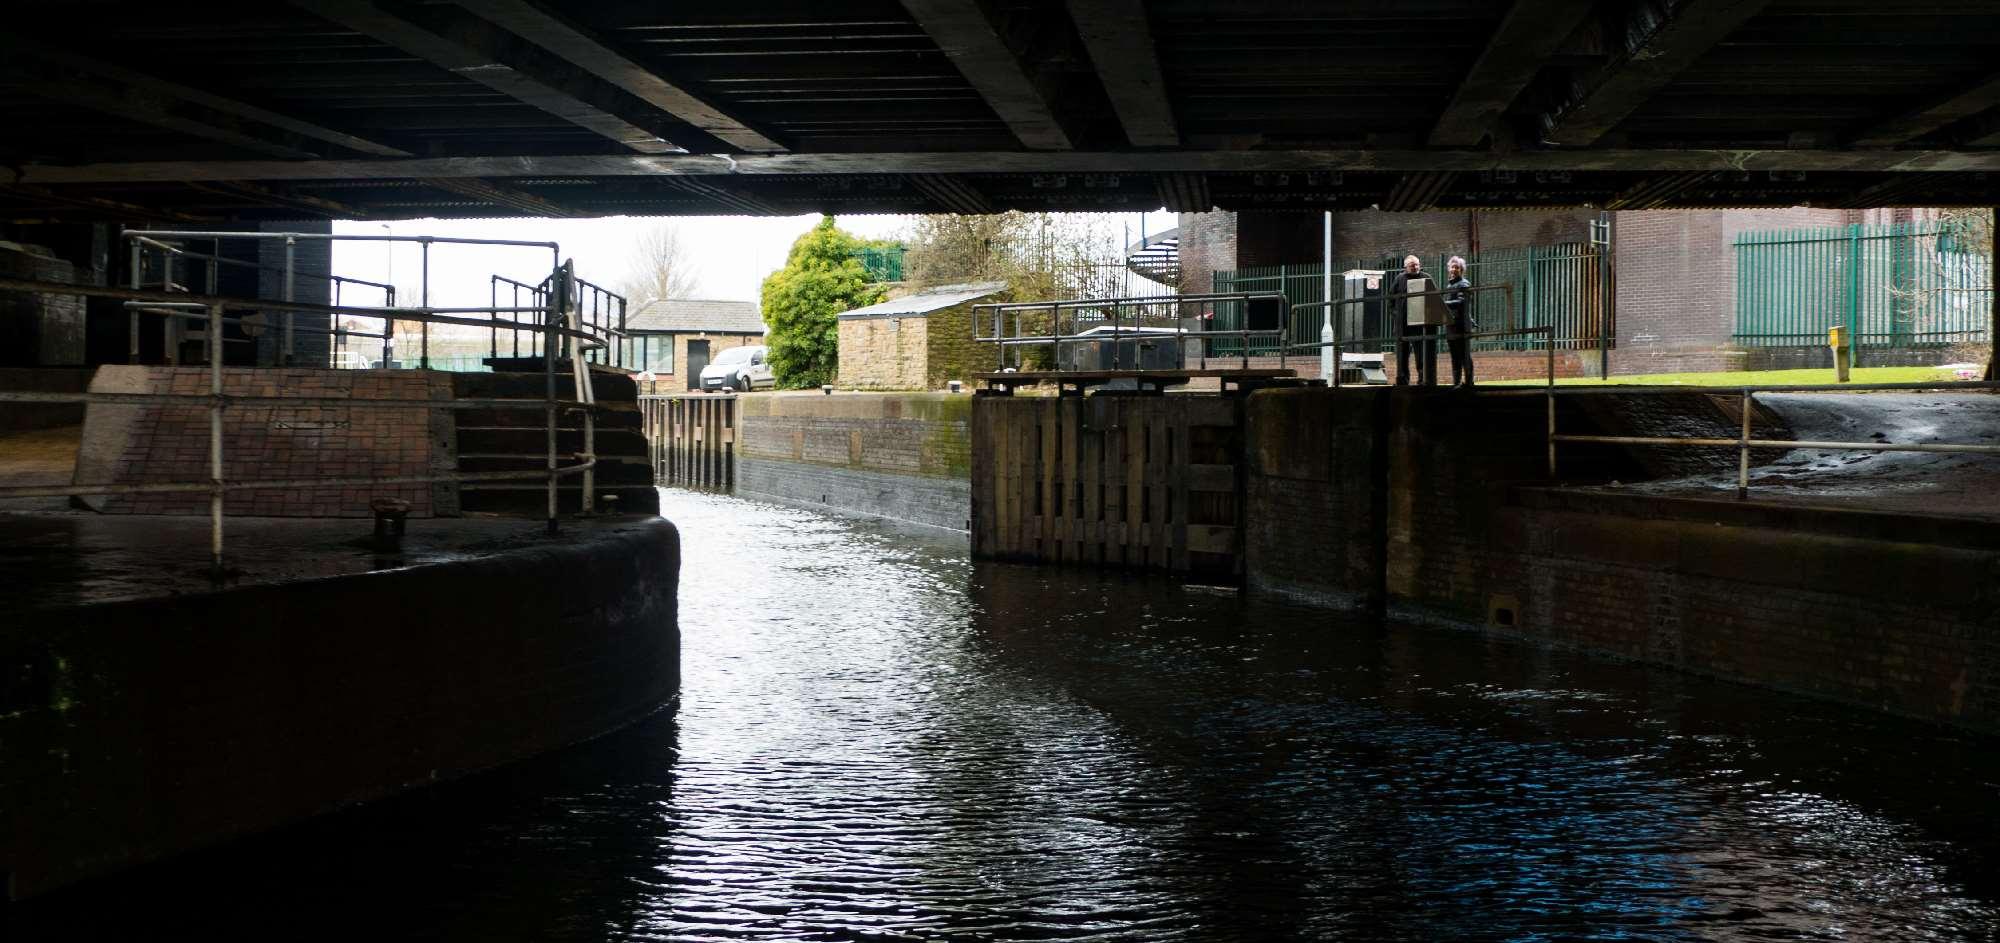 NB Areandare Doncaster Lock